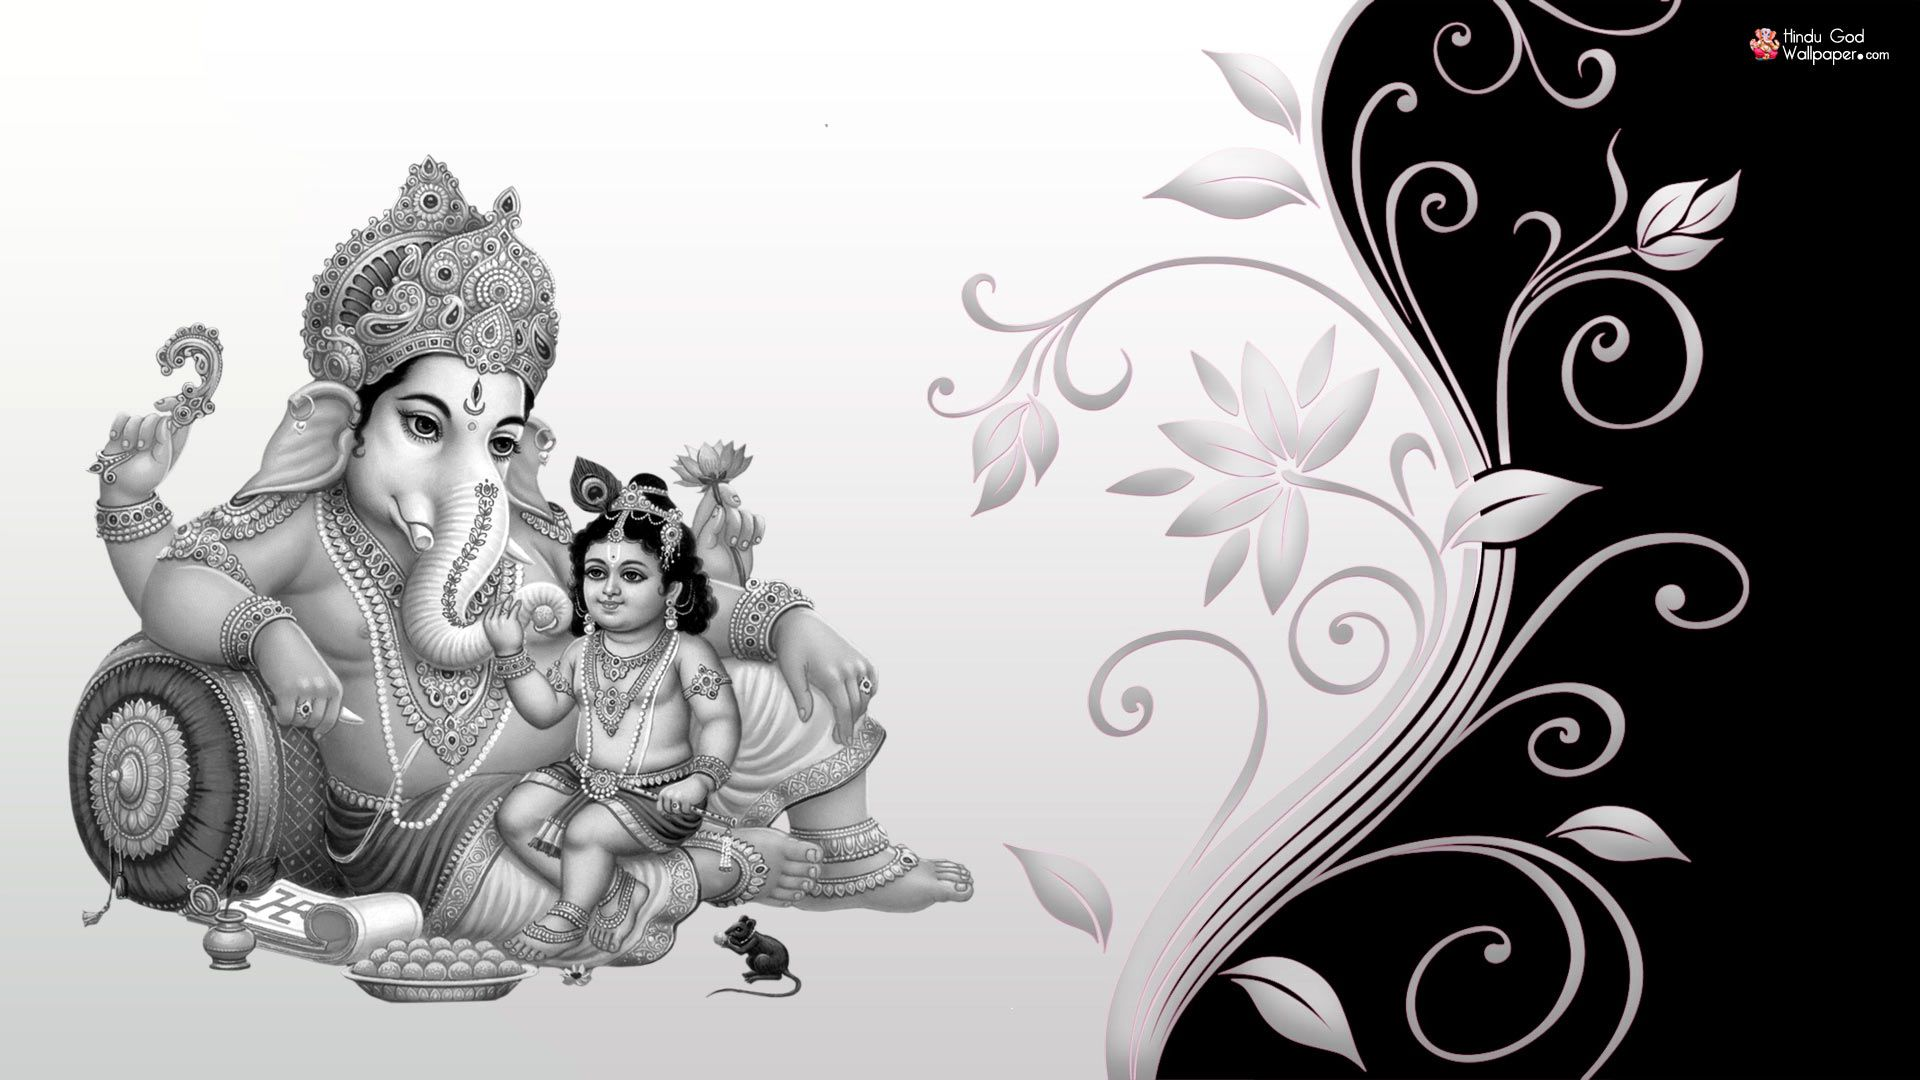 35 Gambar Hd Wallpaper Black And White God Terbaru 2020 Kertas Dinding Gambar Lord Shiva